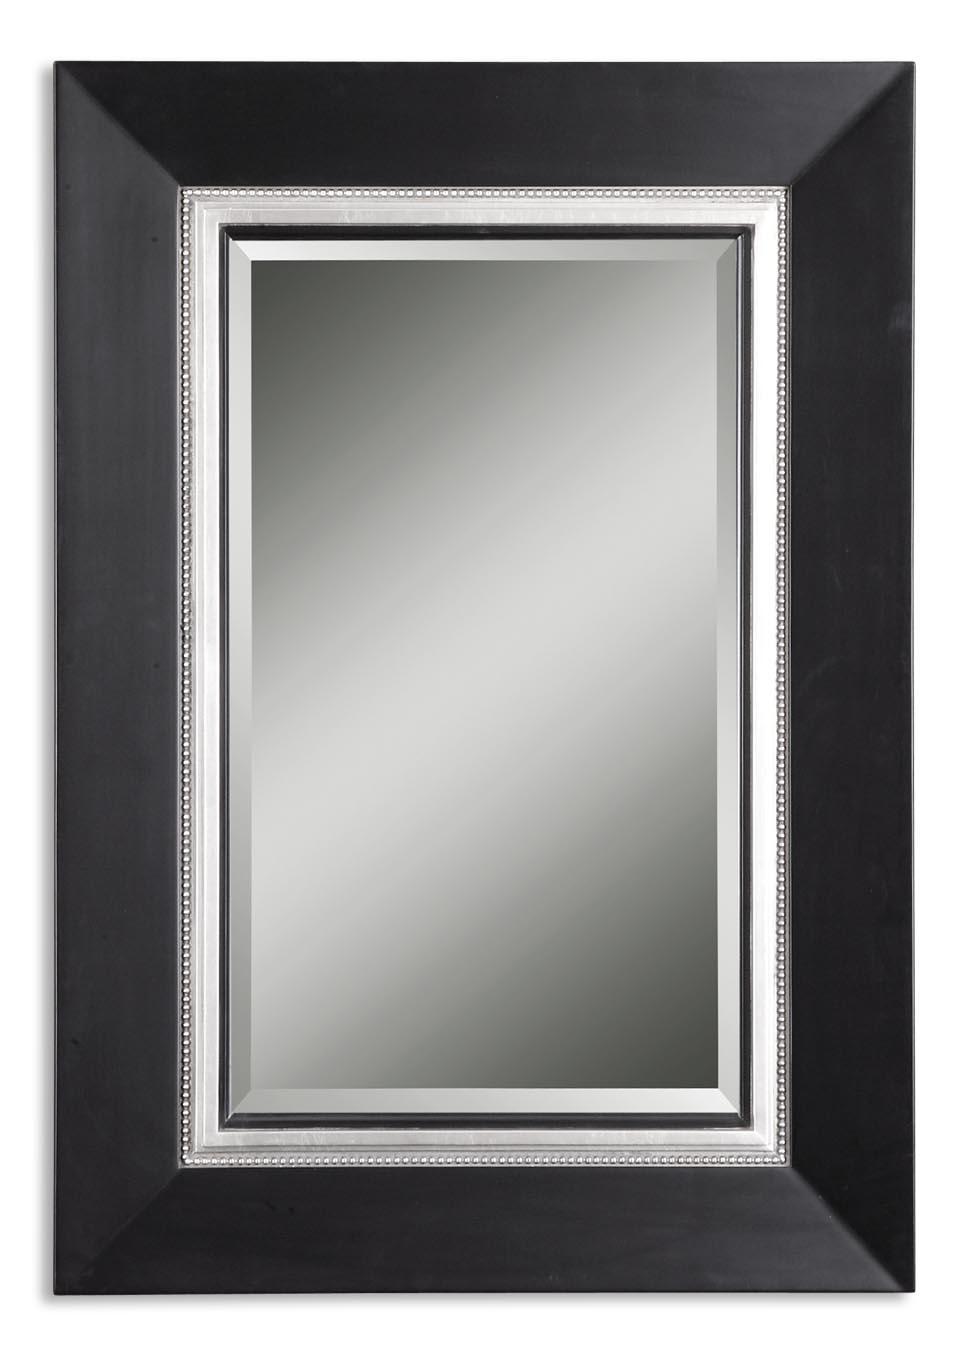 Uttermost Mirrors Whitmore Vanity - Item Number: 14153 B